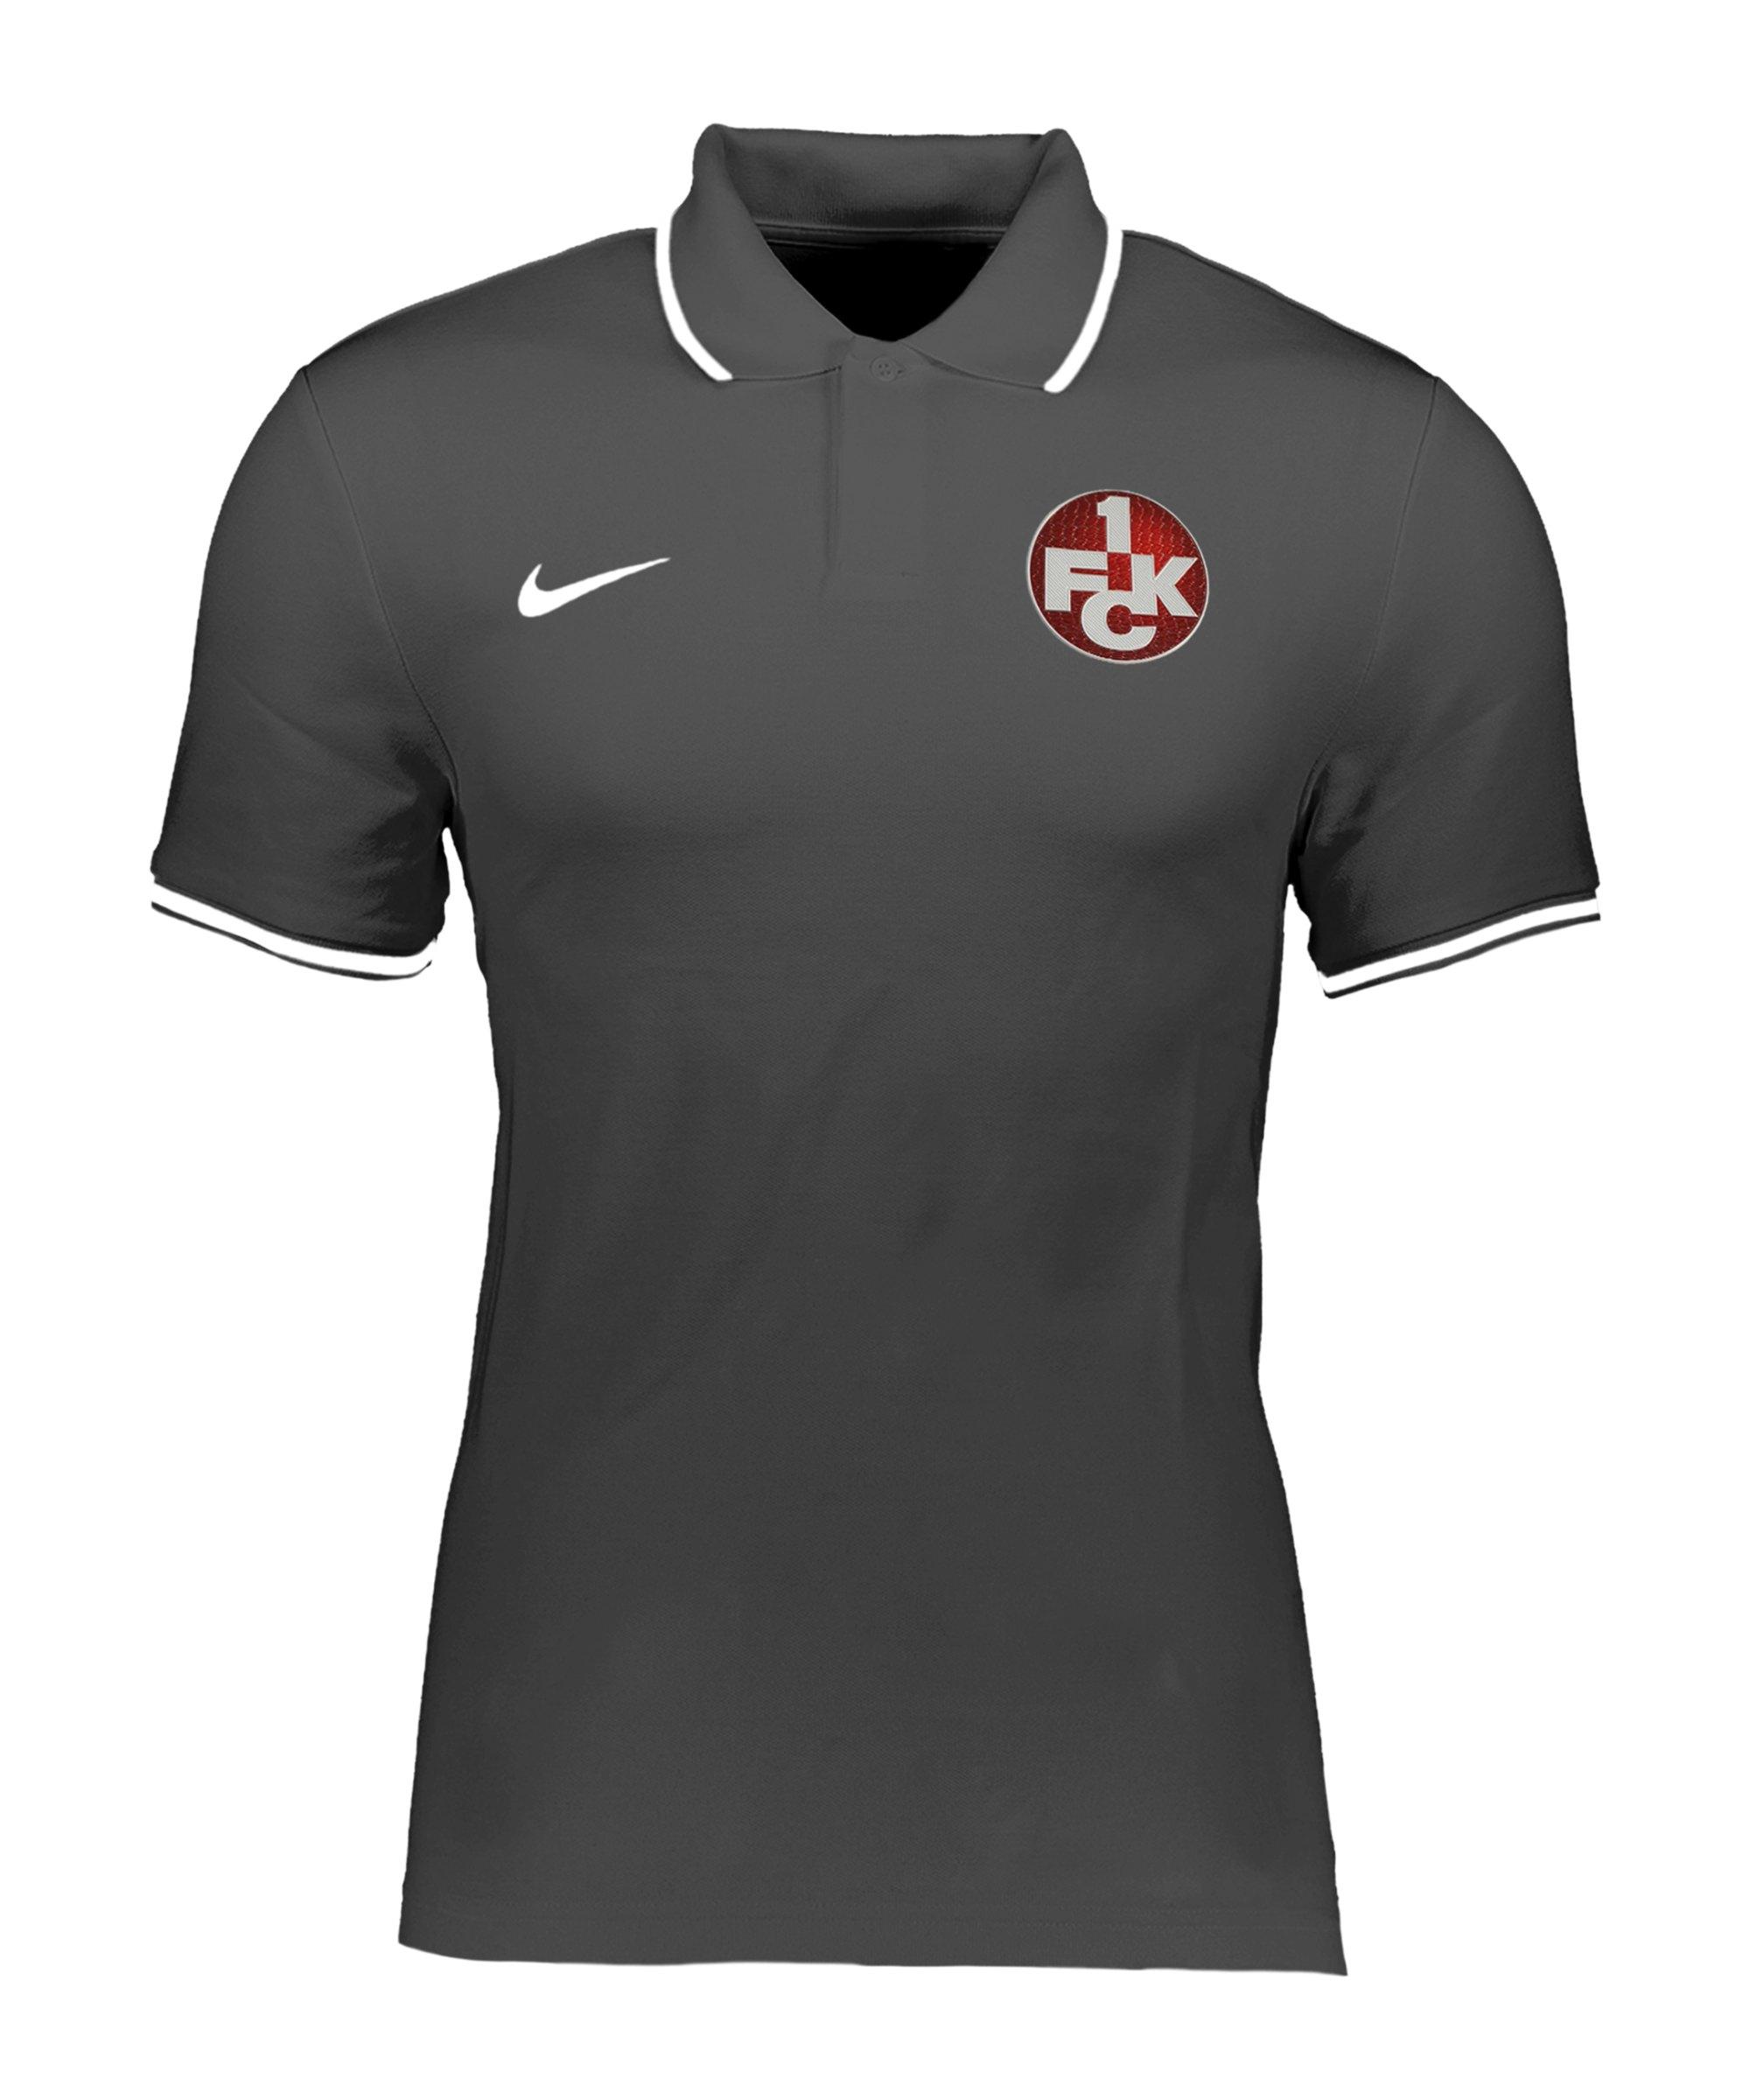 Nike 1. FC Kaiserslautern Poloshirt Kids Grau F071 - grau